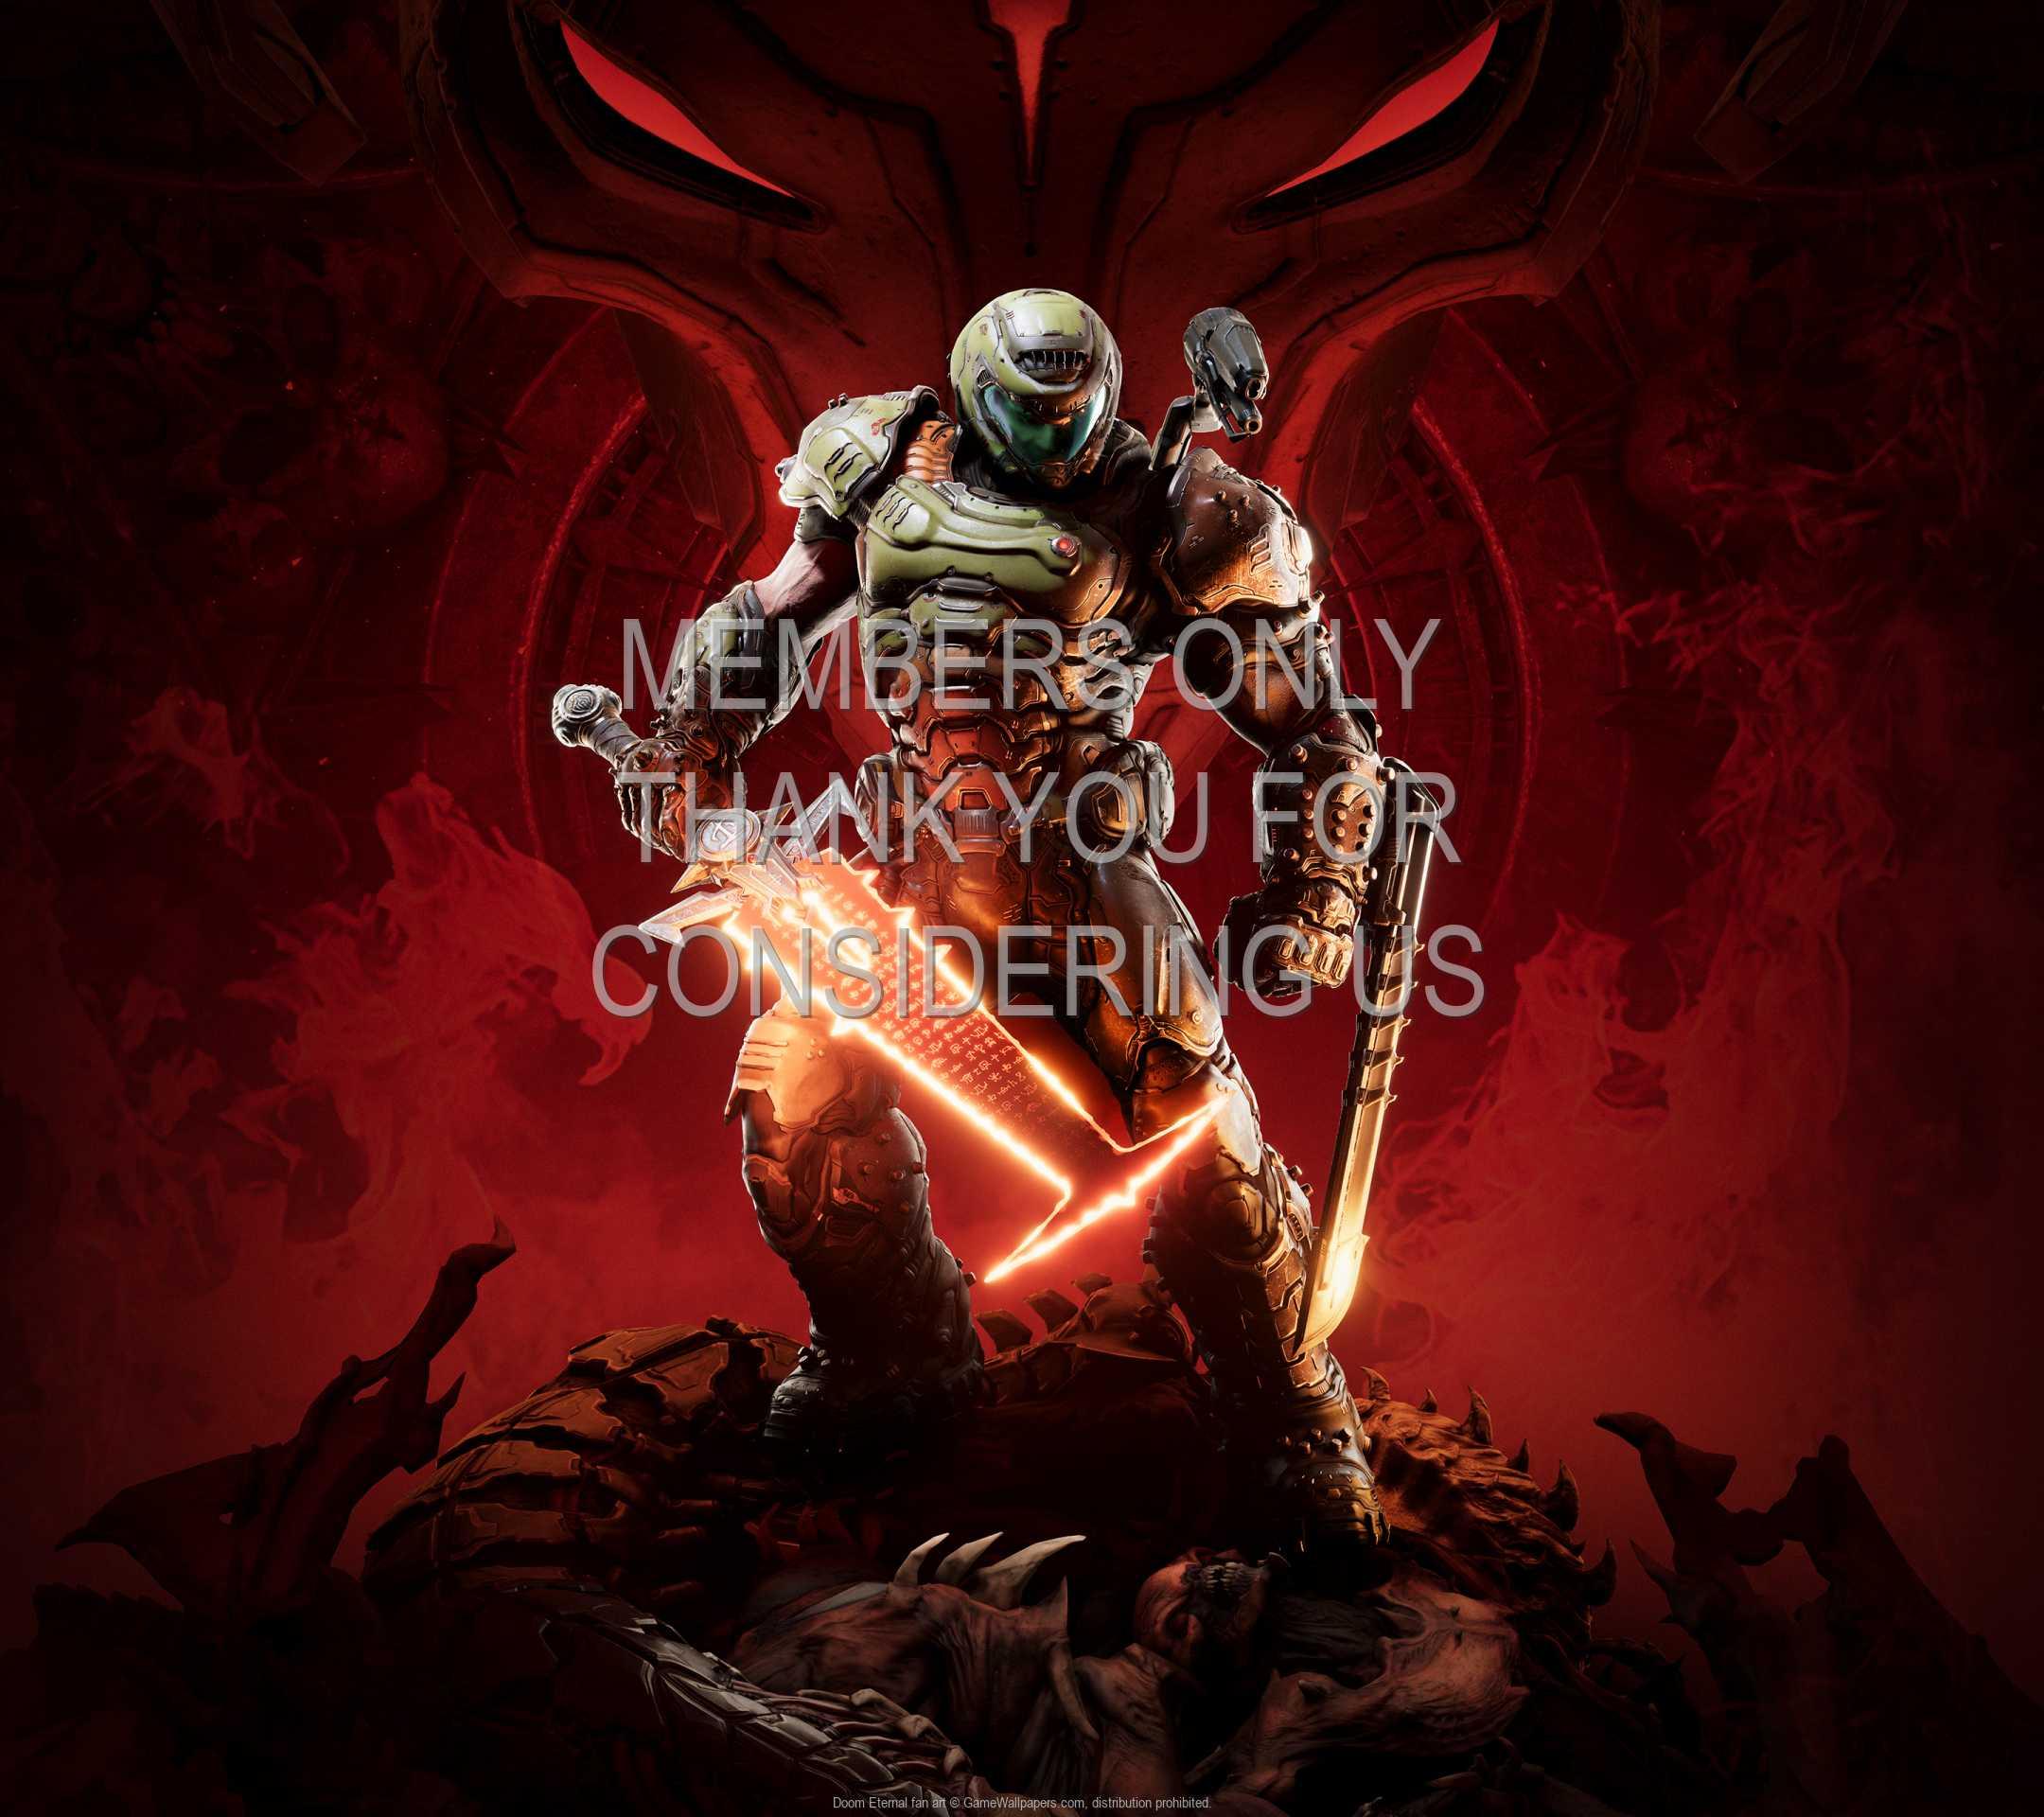 Doom Eternal fan art 1080p Horizontal Mobile wallpaper or background 01